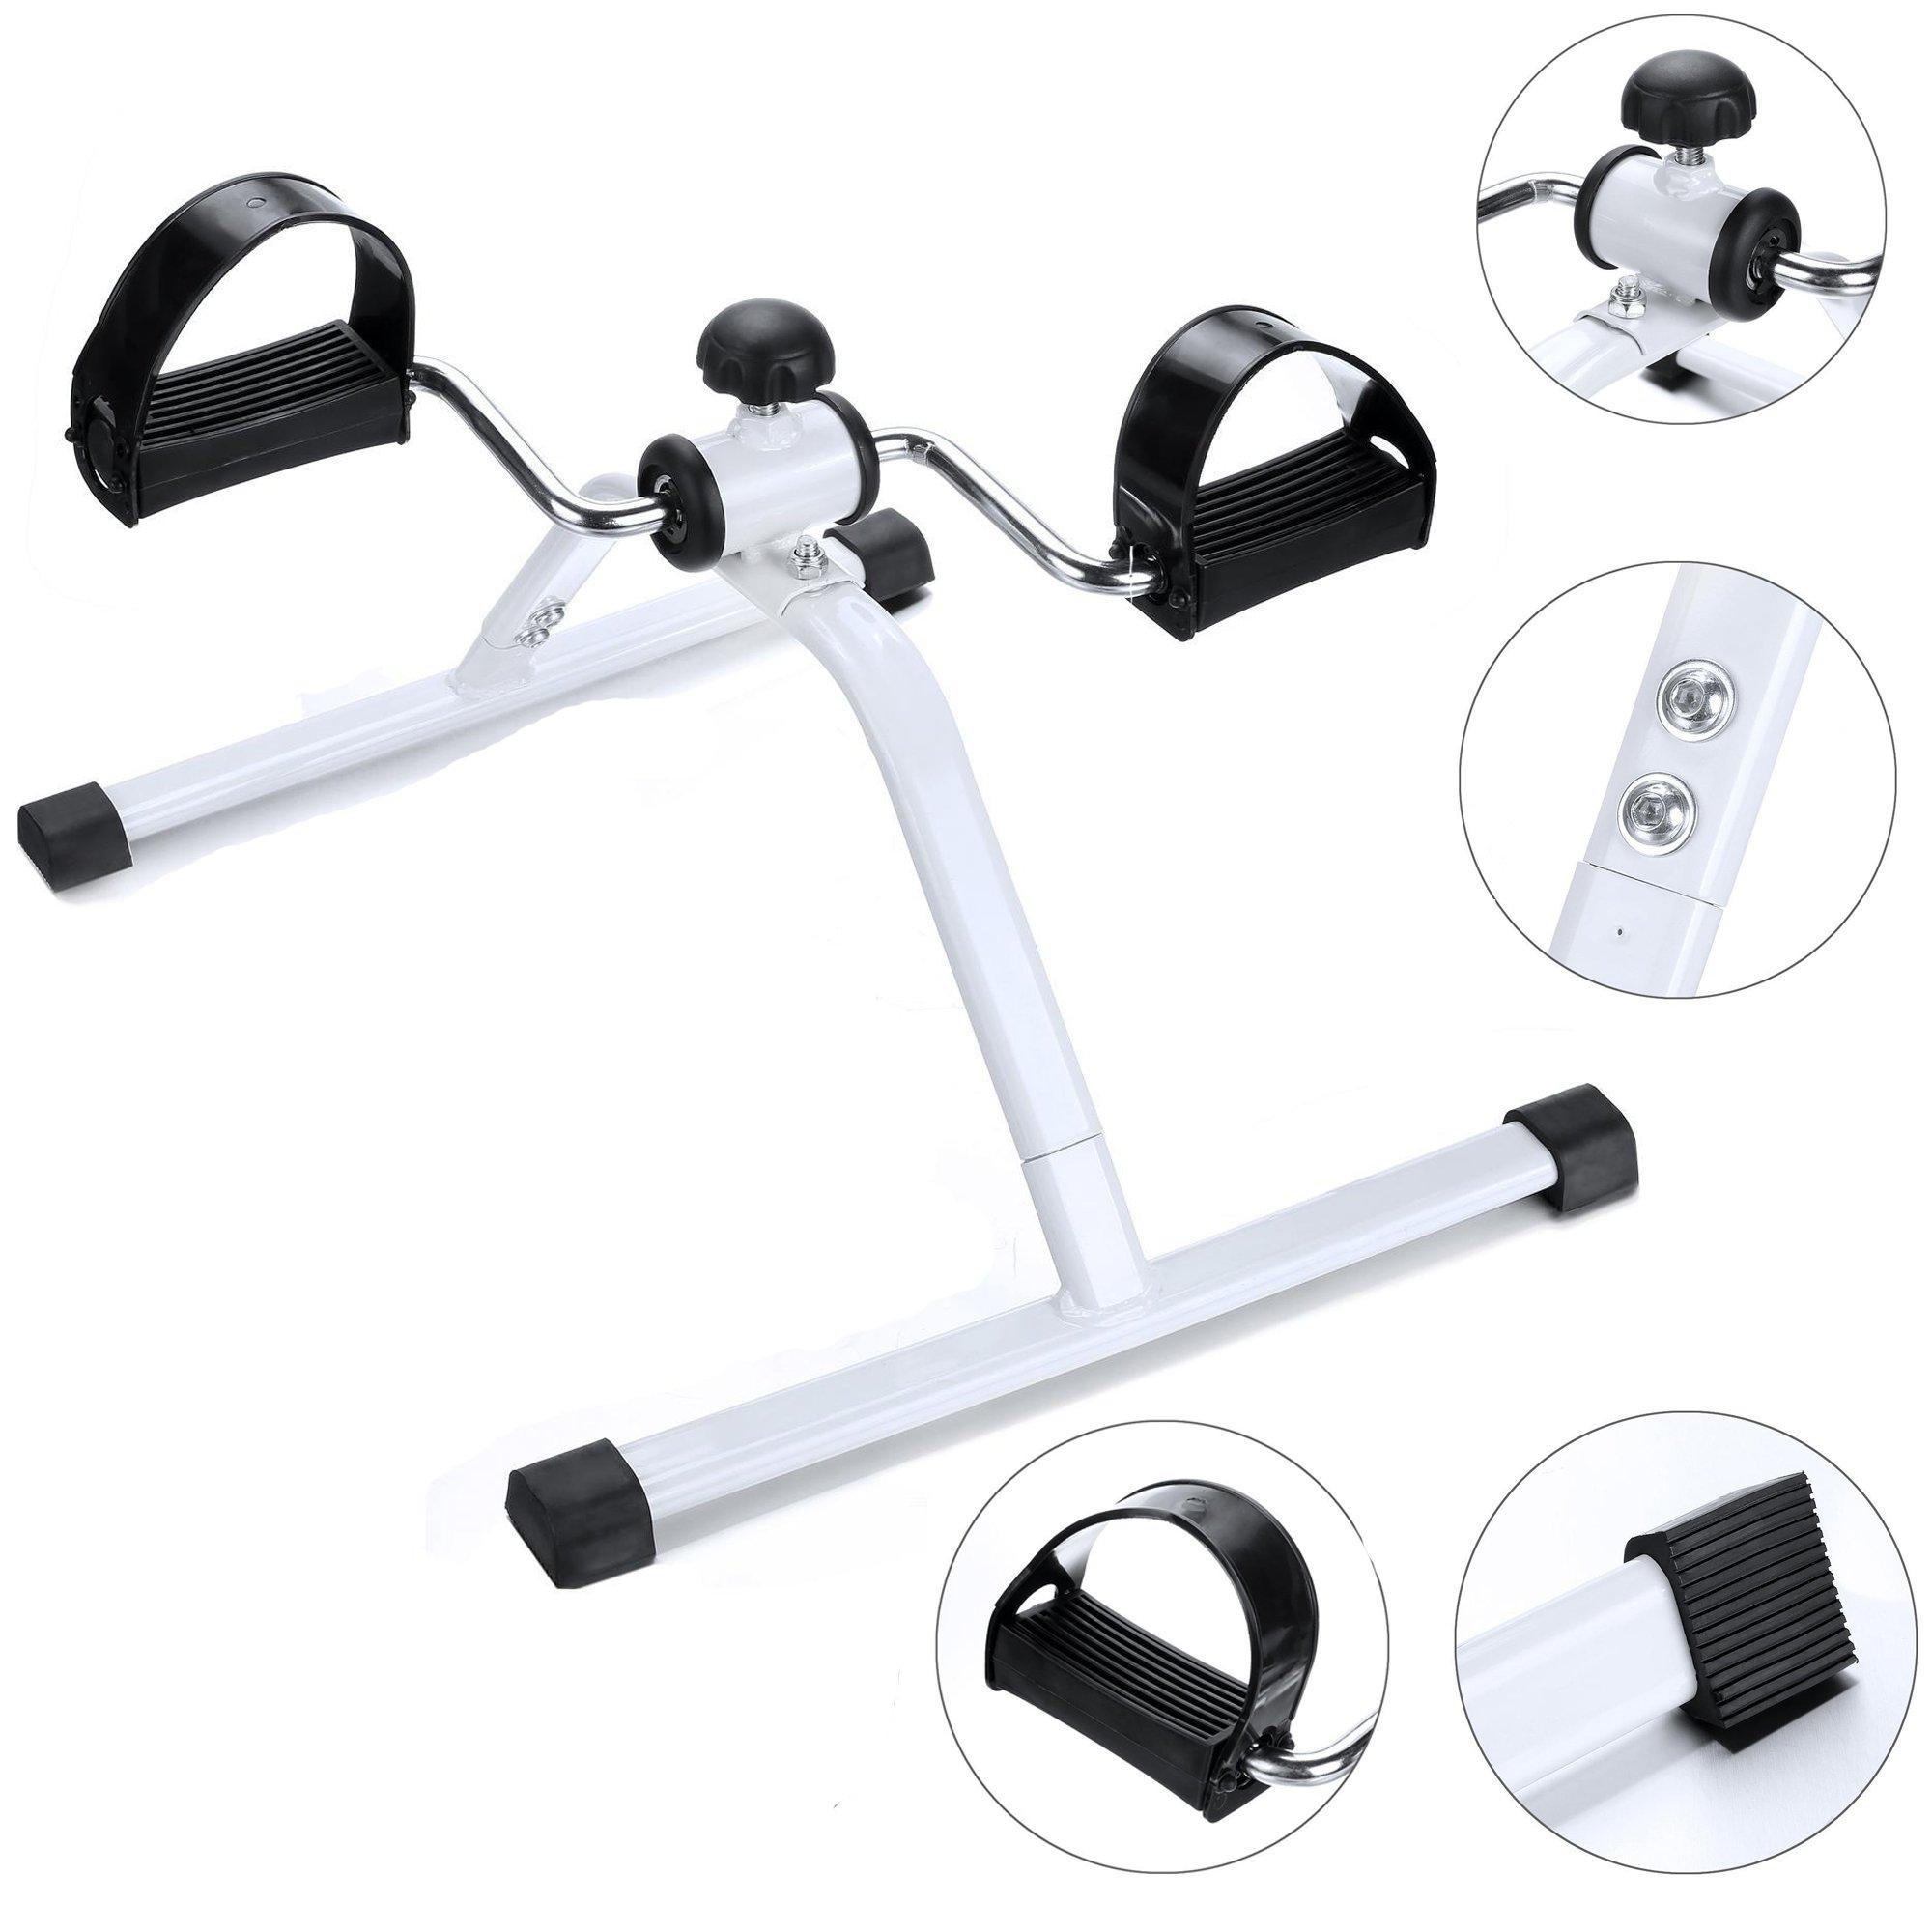 Asatr Leg Pedal Exerciser, Mini Exercise Bike Arm and Leg Exerciser- White-USA